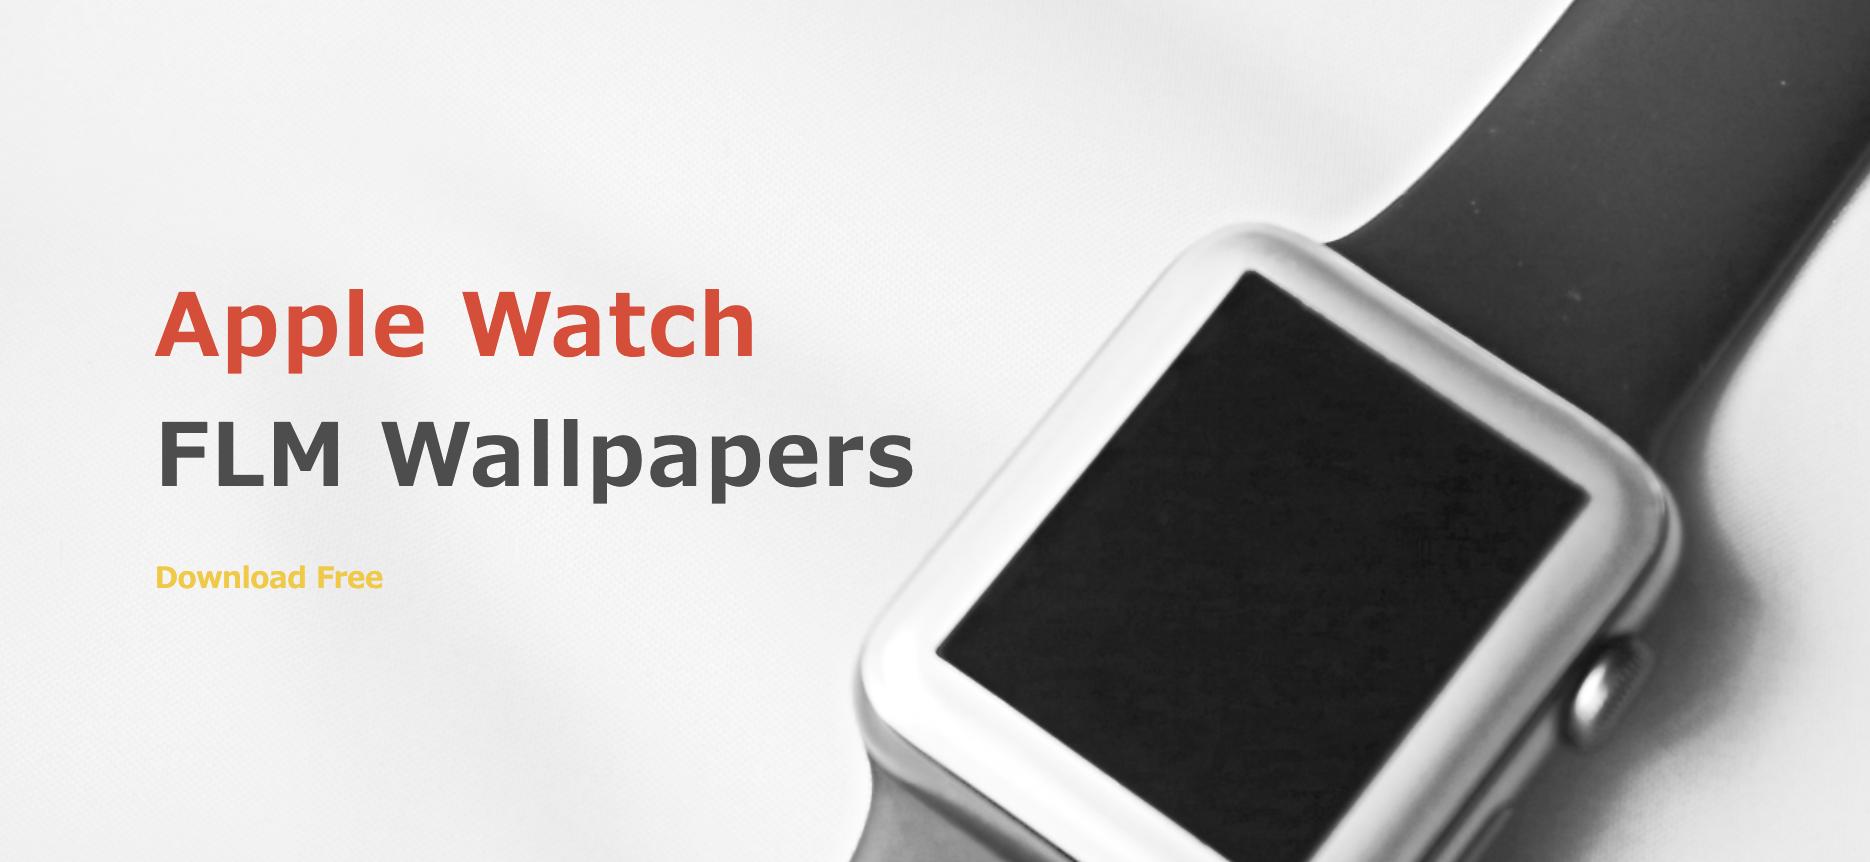 Apple Watch用壁紙の無料配布を開始 Freelancemafia フリーランス